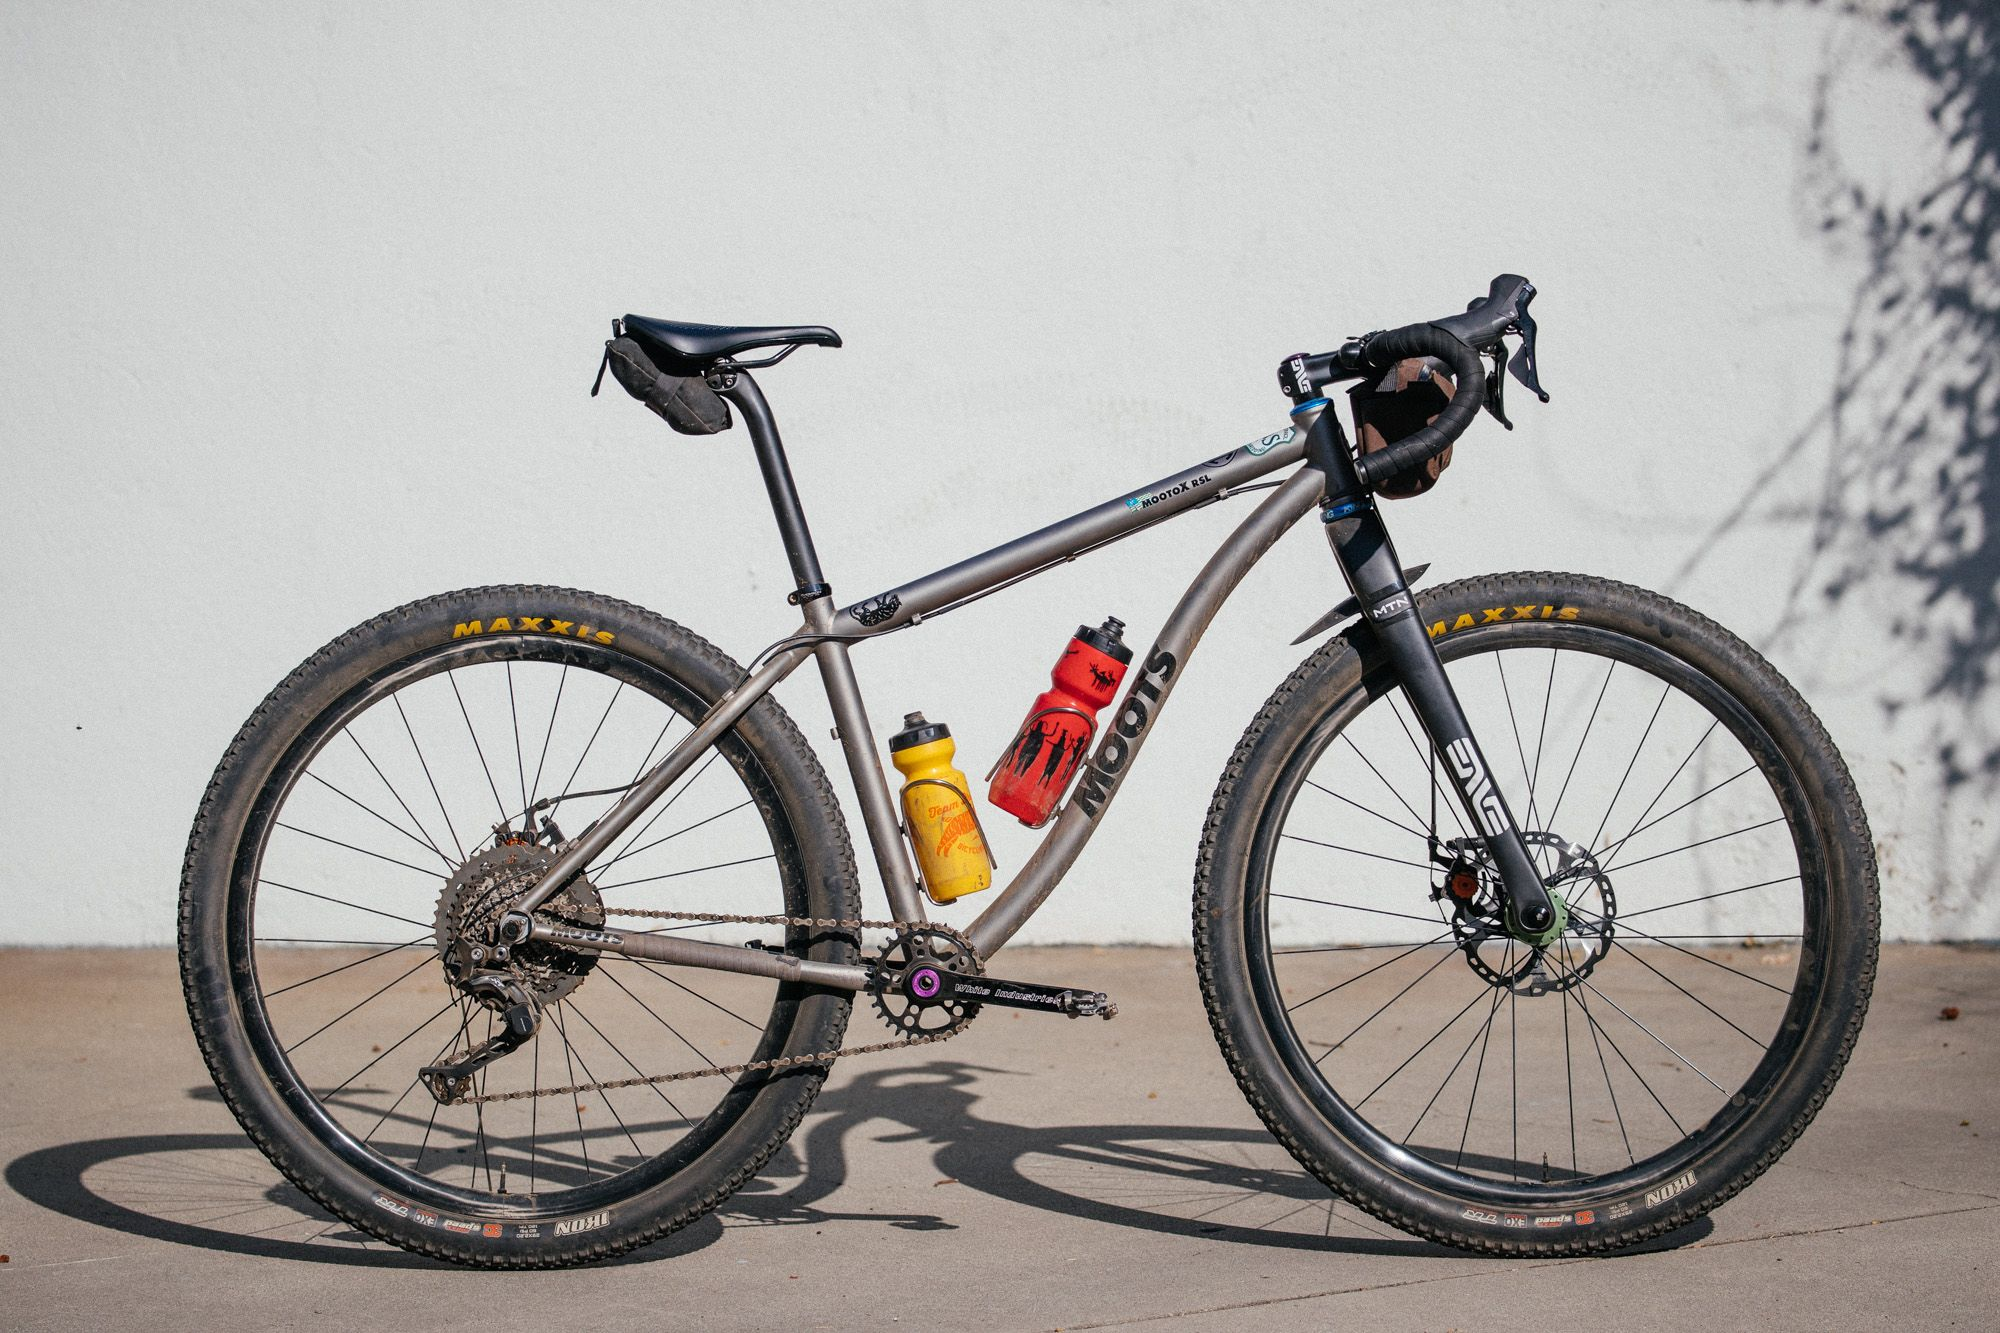 Drop Bars Make It Hot Mike S Moots Mooto X Rsl Dirt Drop Mtb Titanium Bike Touring Bike Gravel Bike